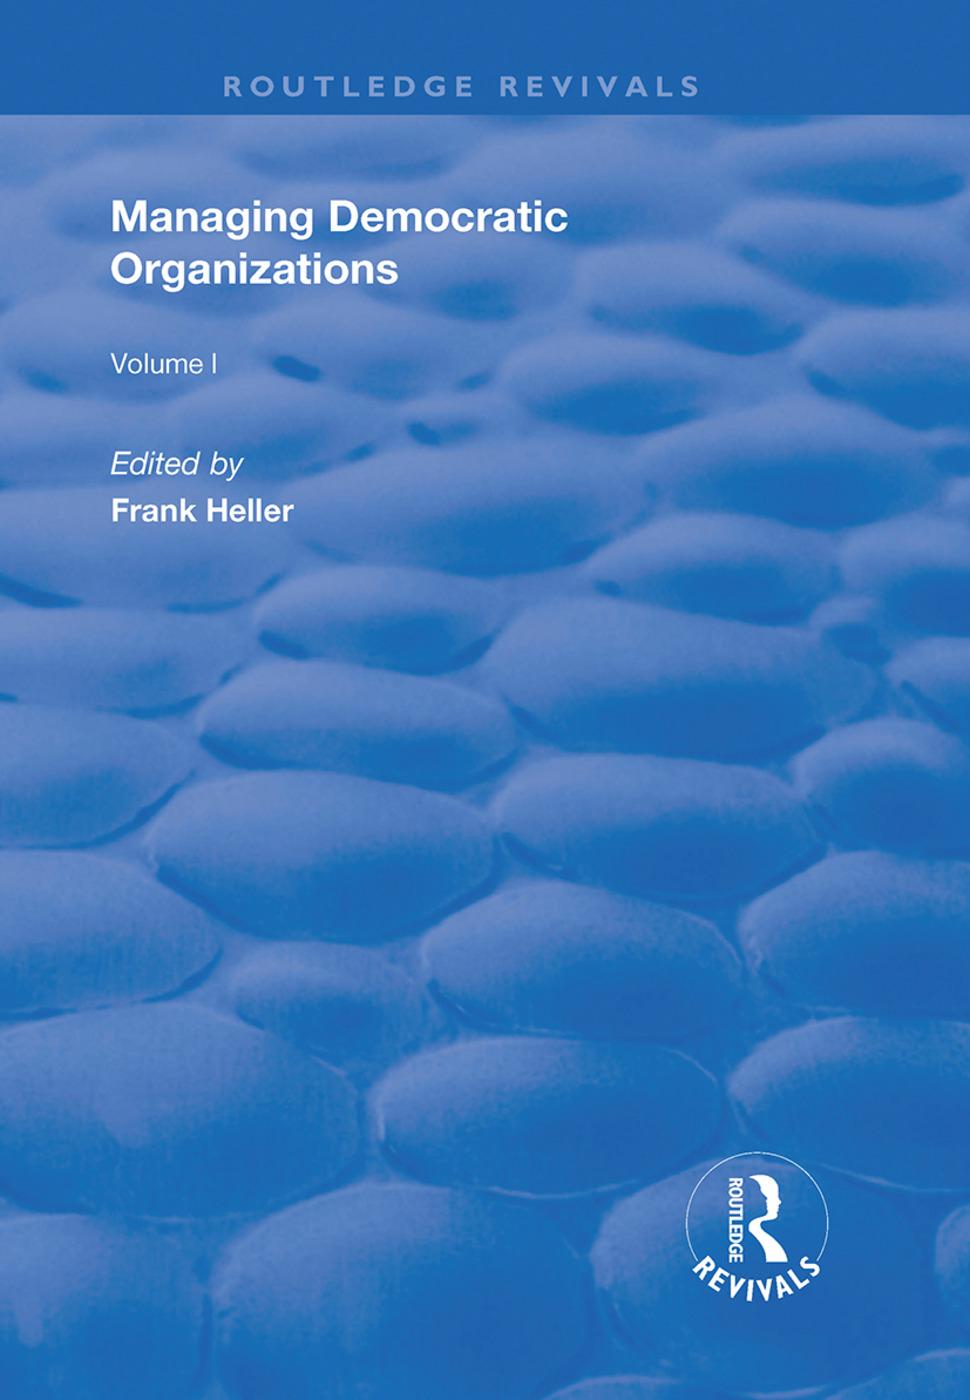 Managing Democratic Organizations I: Volume I book cover